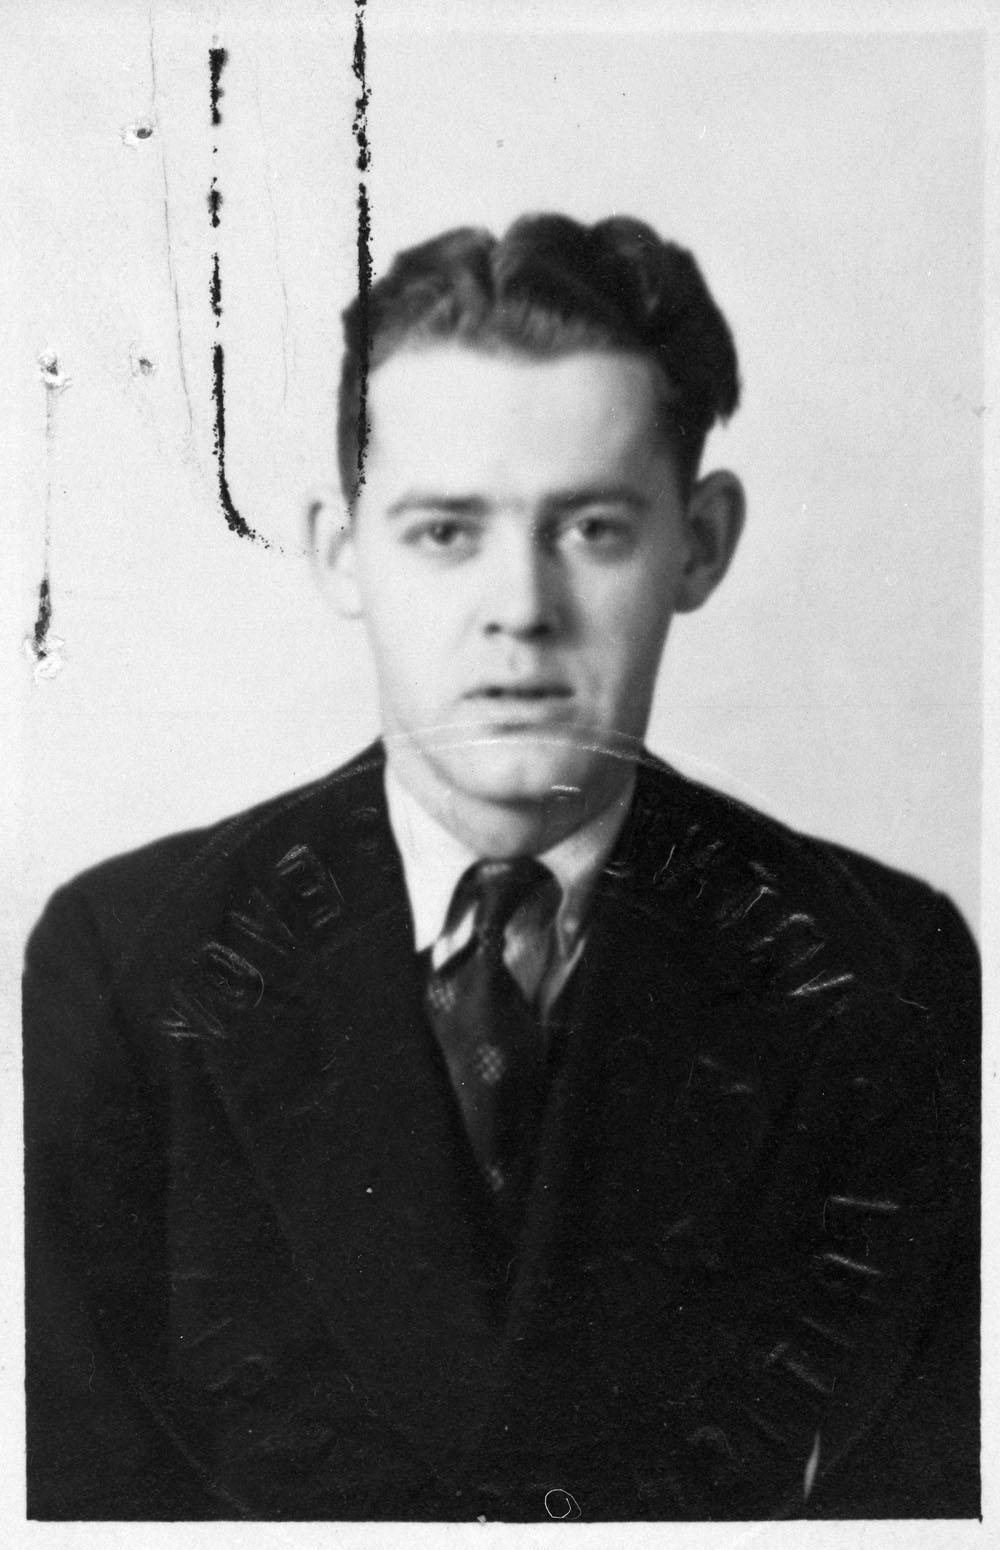 Harold Gislason